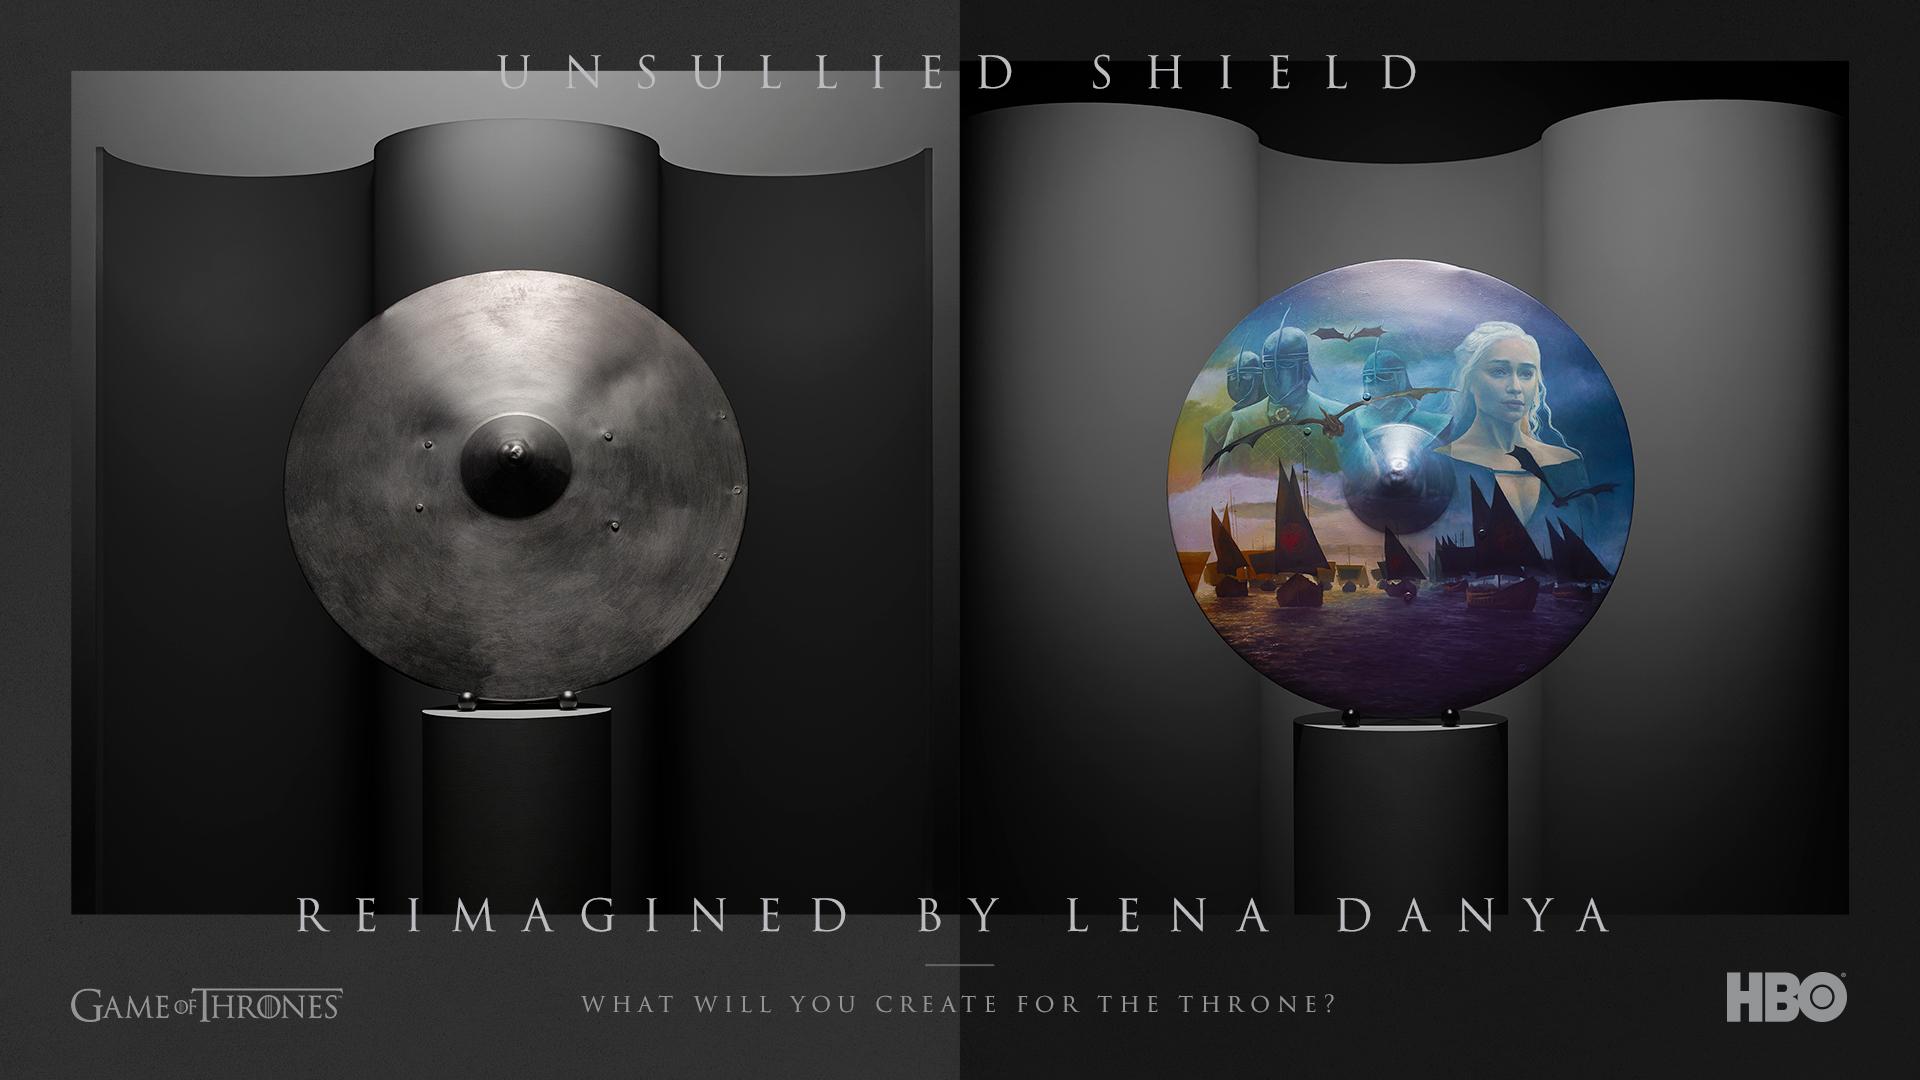 17_HONOR_Unsullied_Shield_Lena_Danya.jpg